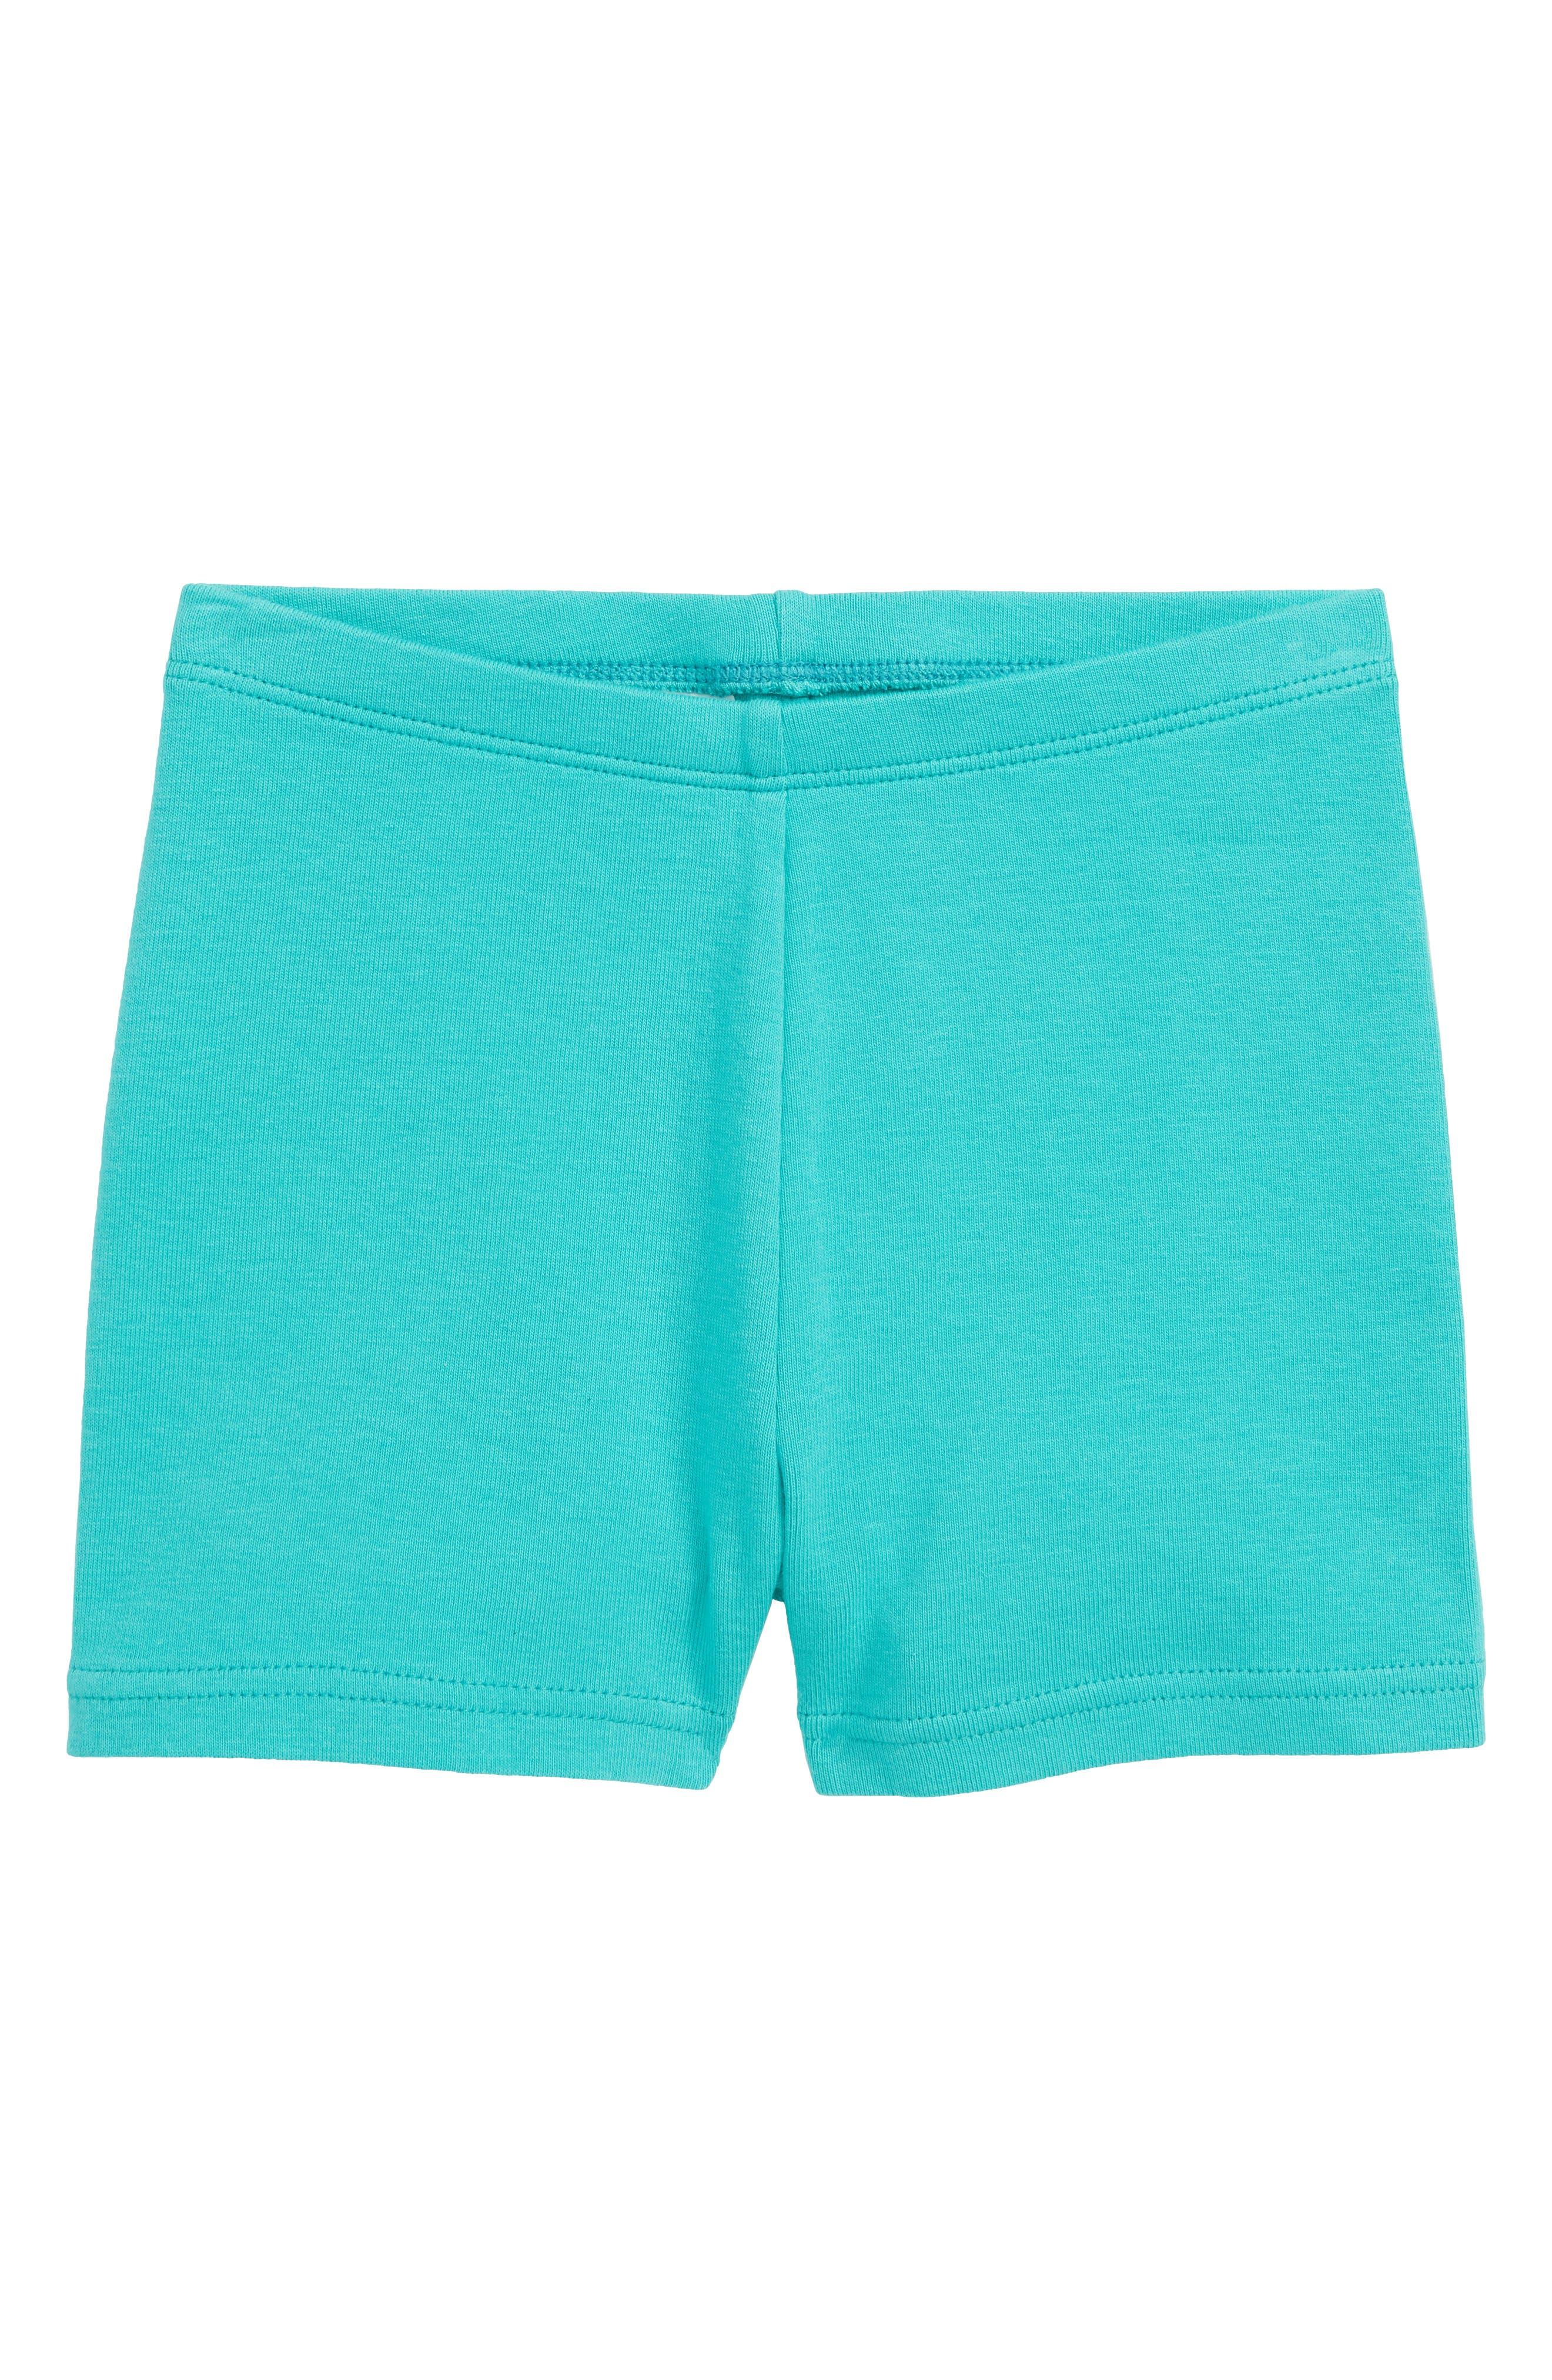 Girls Tea Collection Somersault Shorts Size 4  Bluegreen